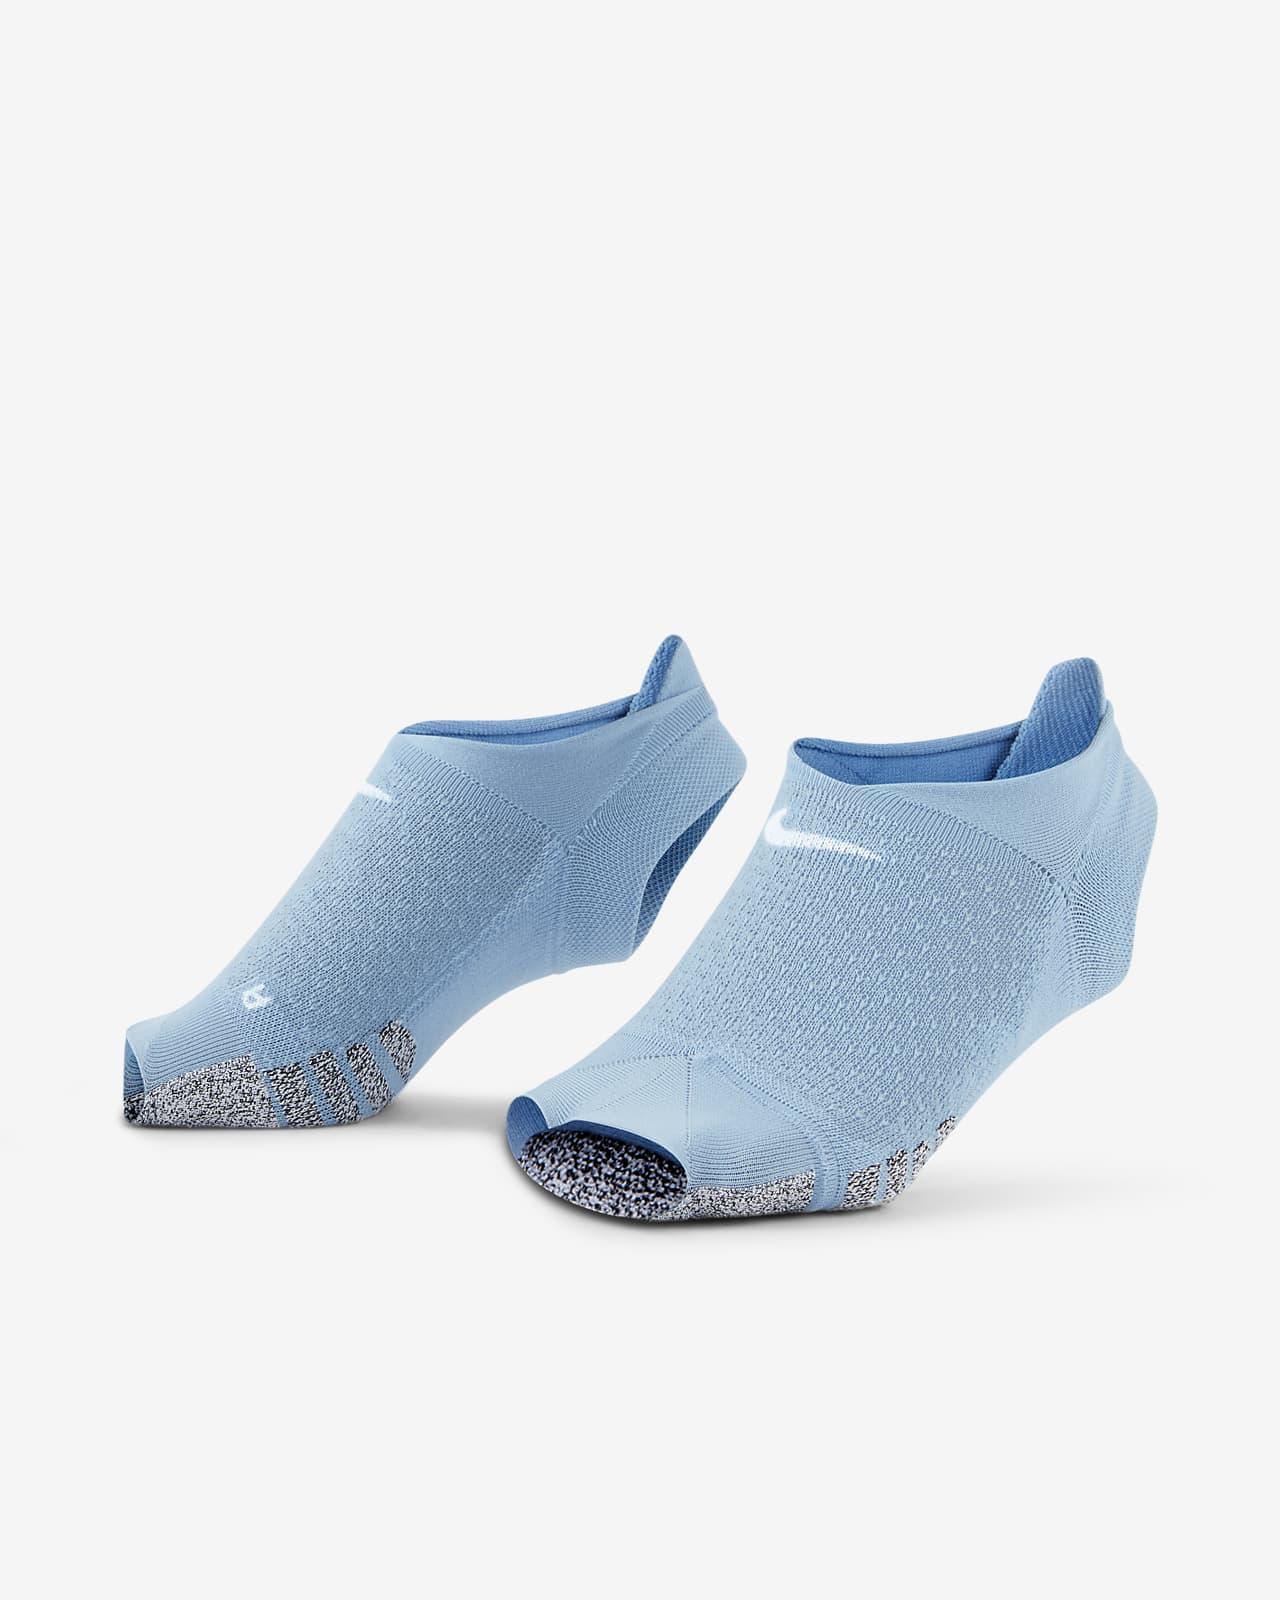 Footie sin puntera para mujer NikeGrip Studio